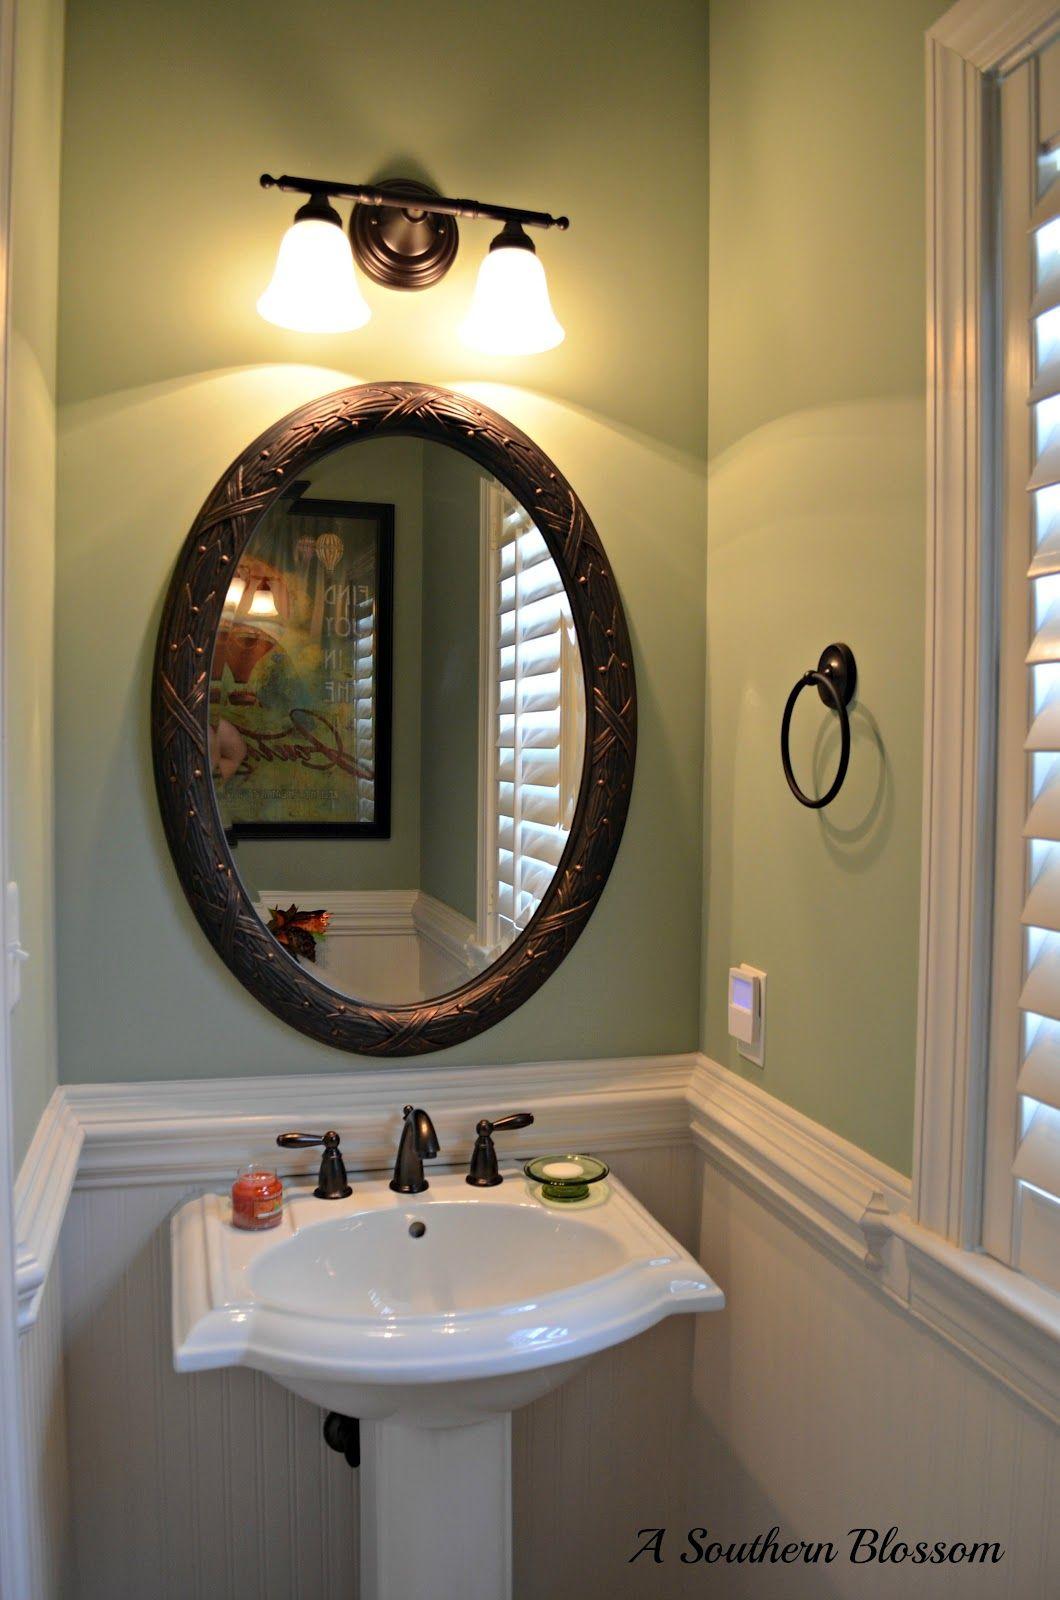 Half bathroom paint ideas - Accent Colors In A Cream And Caramel Bathroom But Before I S Half Bathroom Paint